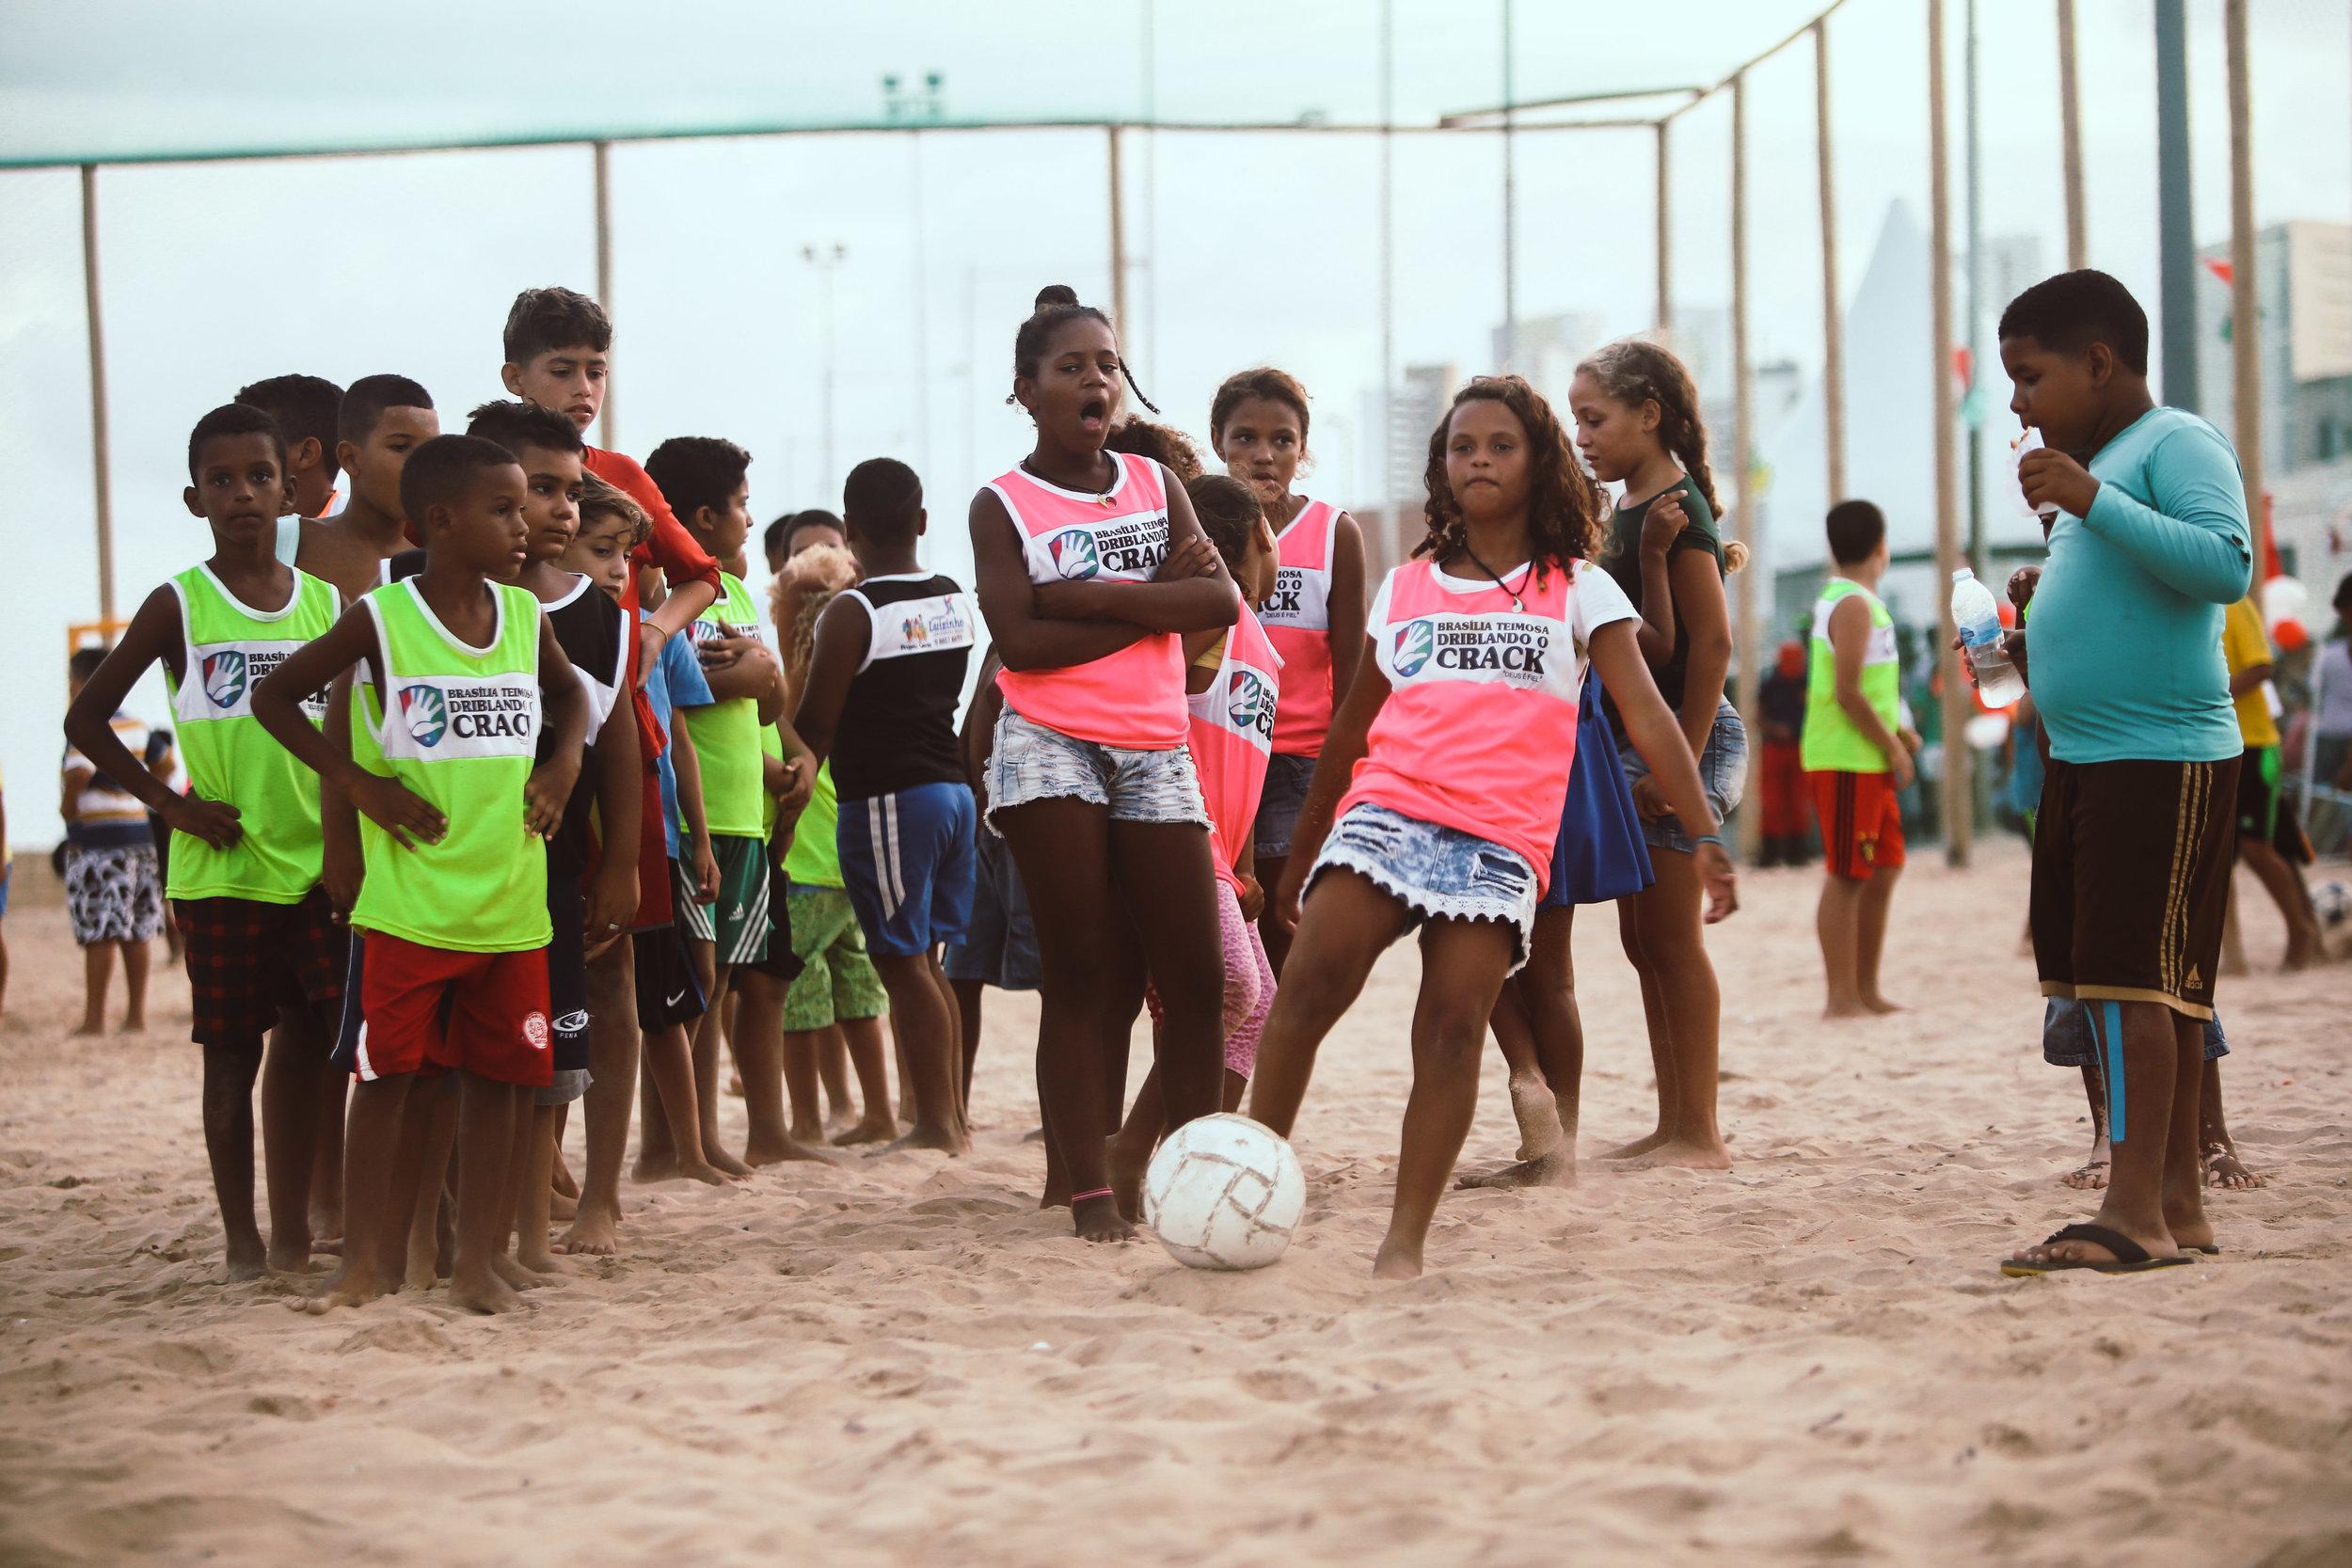 INAUGURACAO BRASILIA TEIMOSA_PB TEIMOSA_PRISCILLABUHR-212.jpg